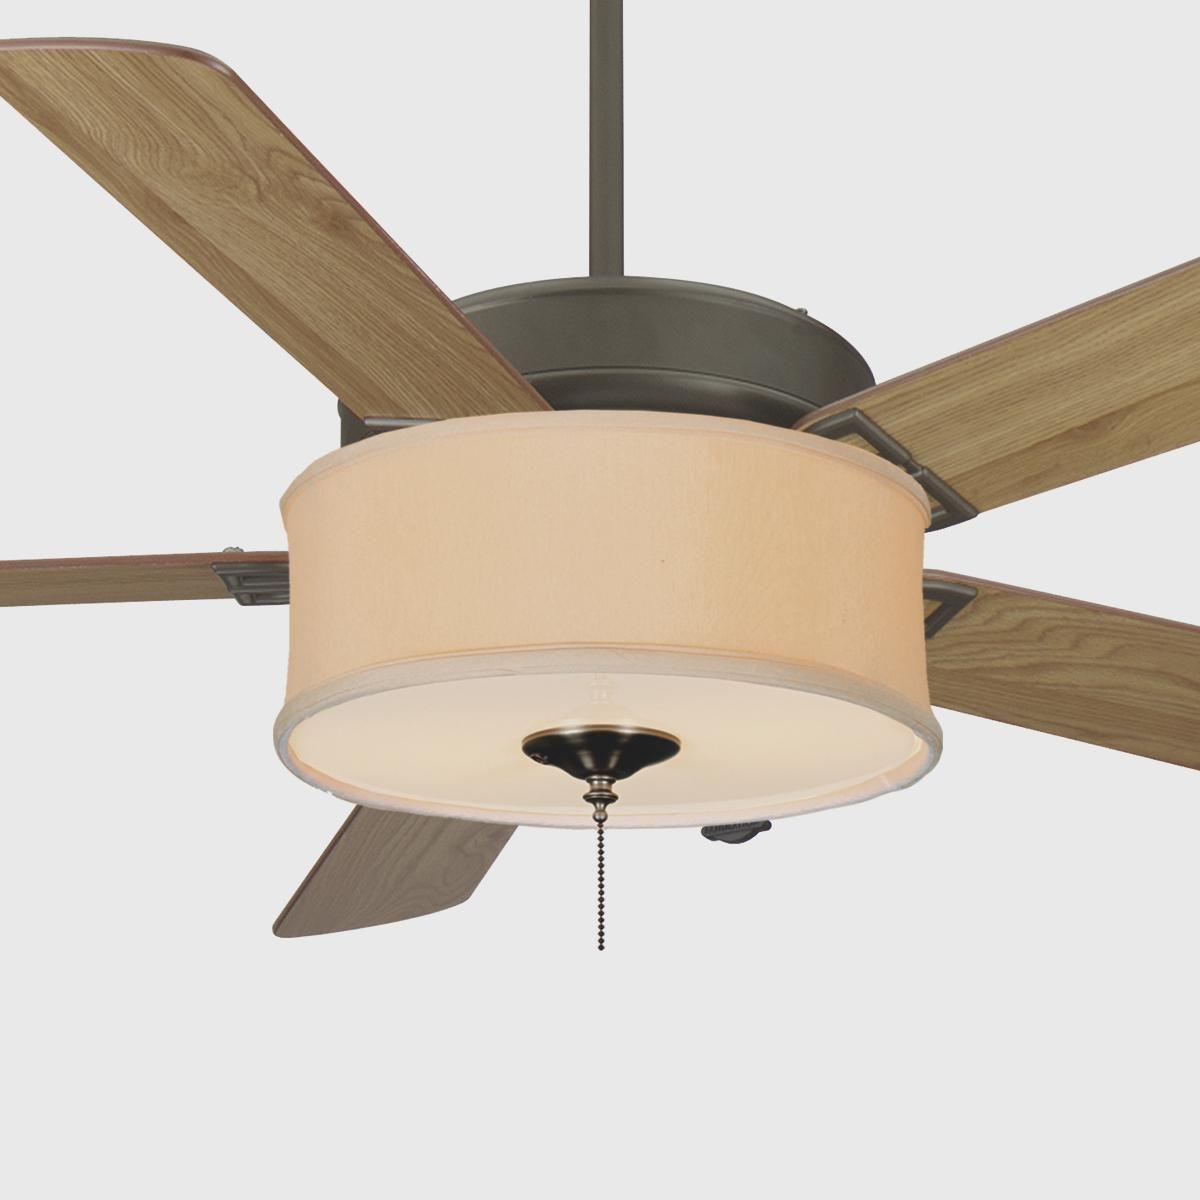 Drum shade energy efficient fan light kit 199 swap out fan light drum shade energy efficient fan light kit 199 swap out fan light fixtures with this one arubaitofo Images